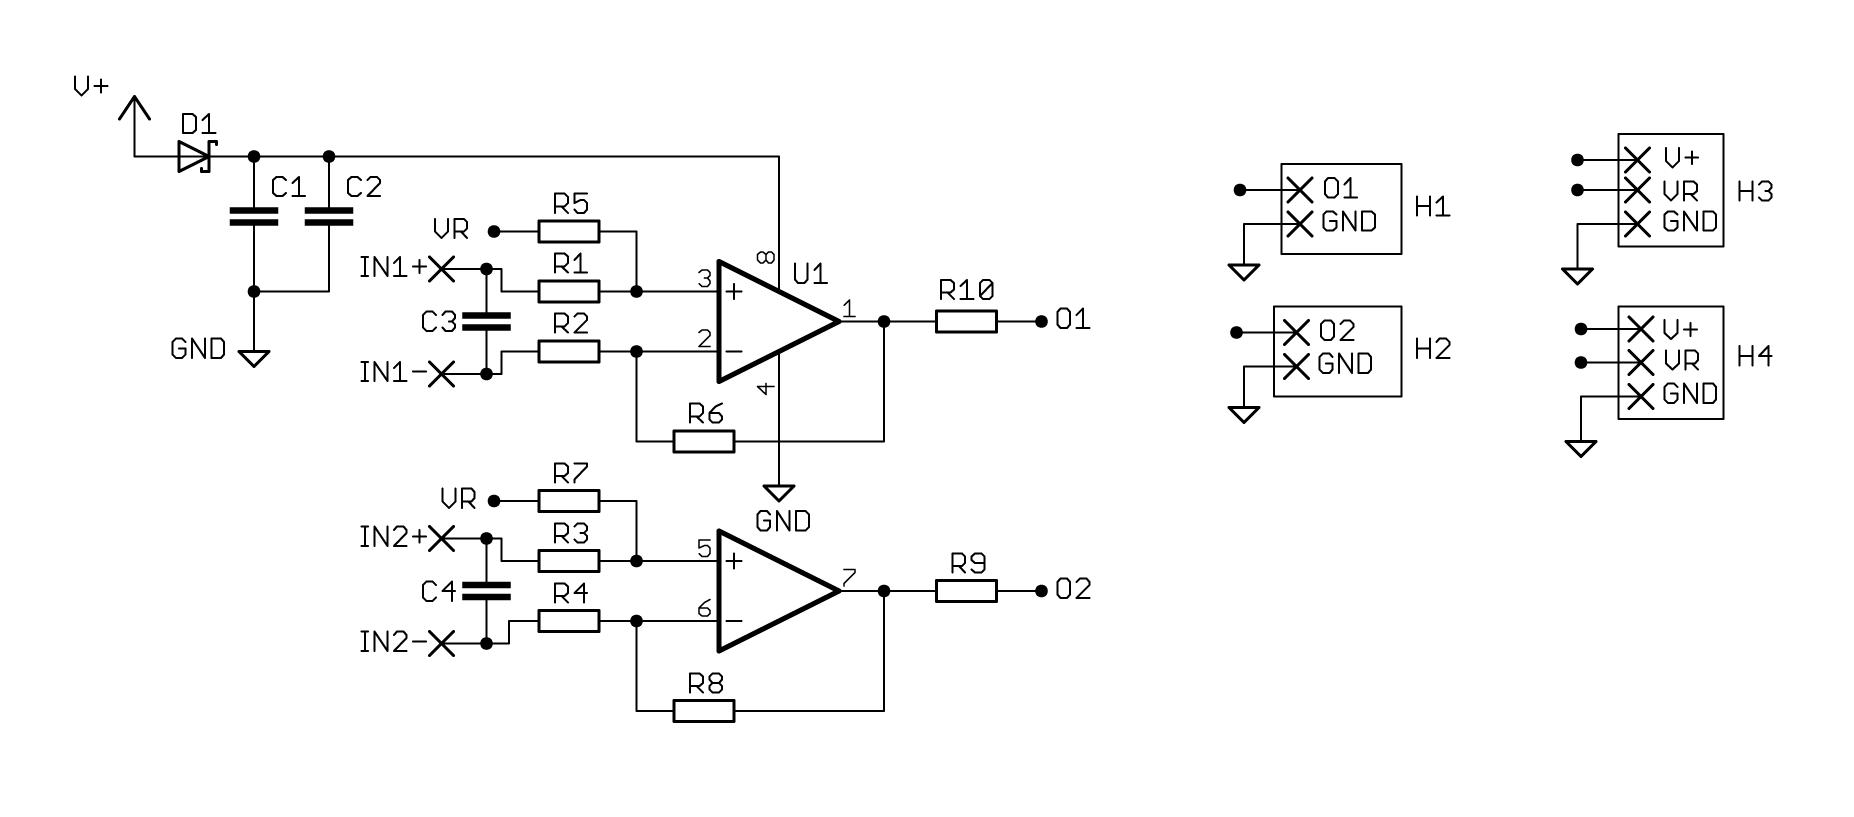 Neo2 v1.4 Schematic